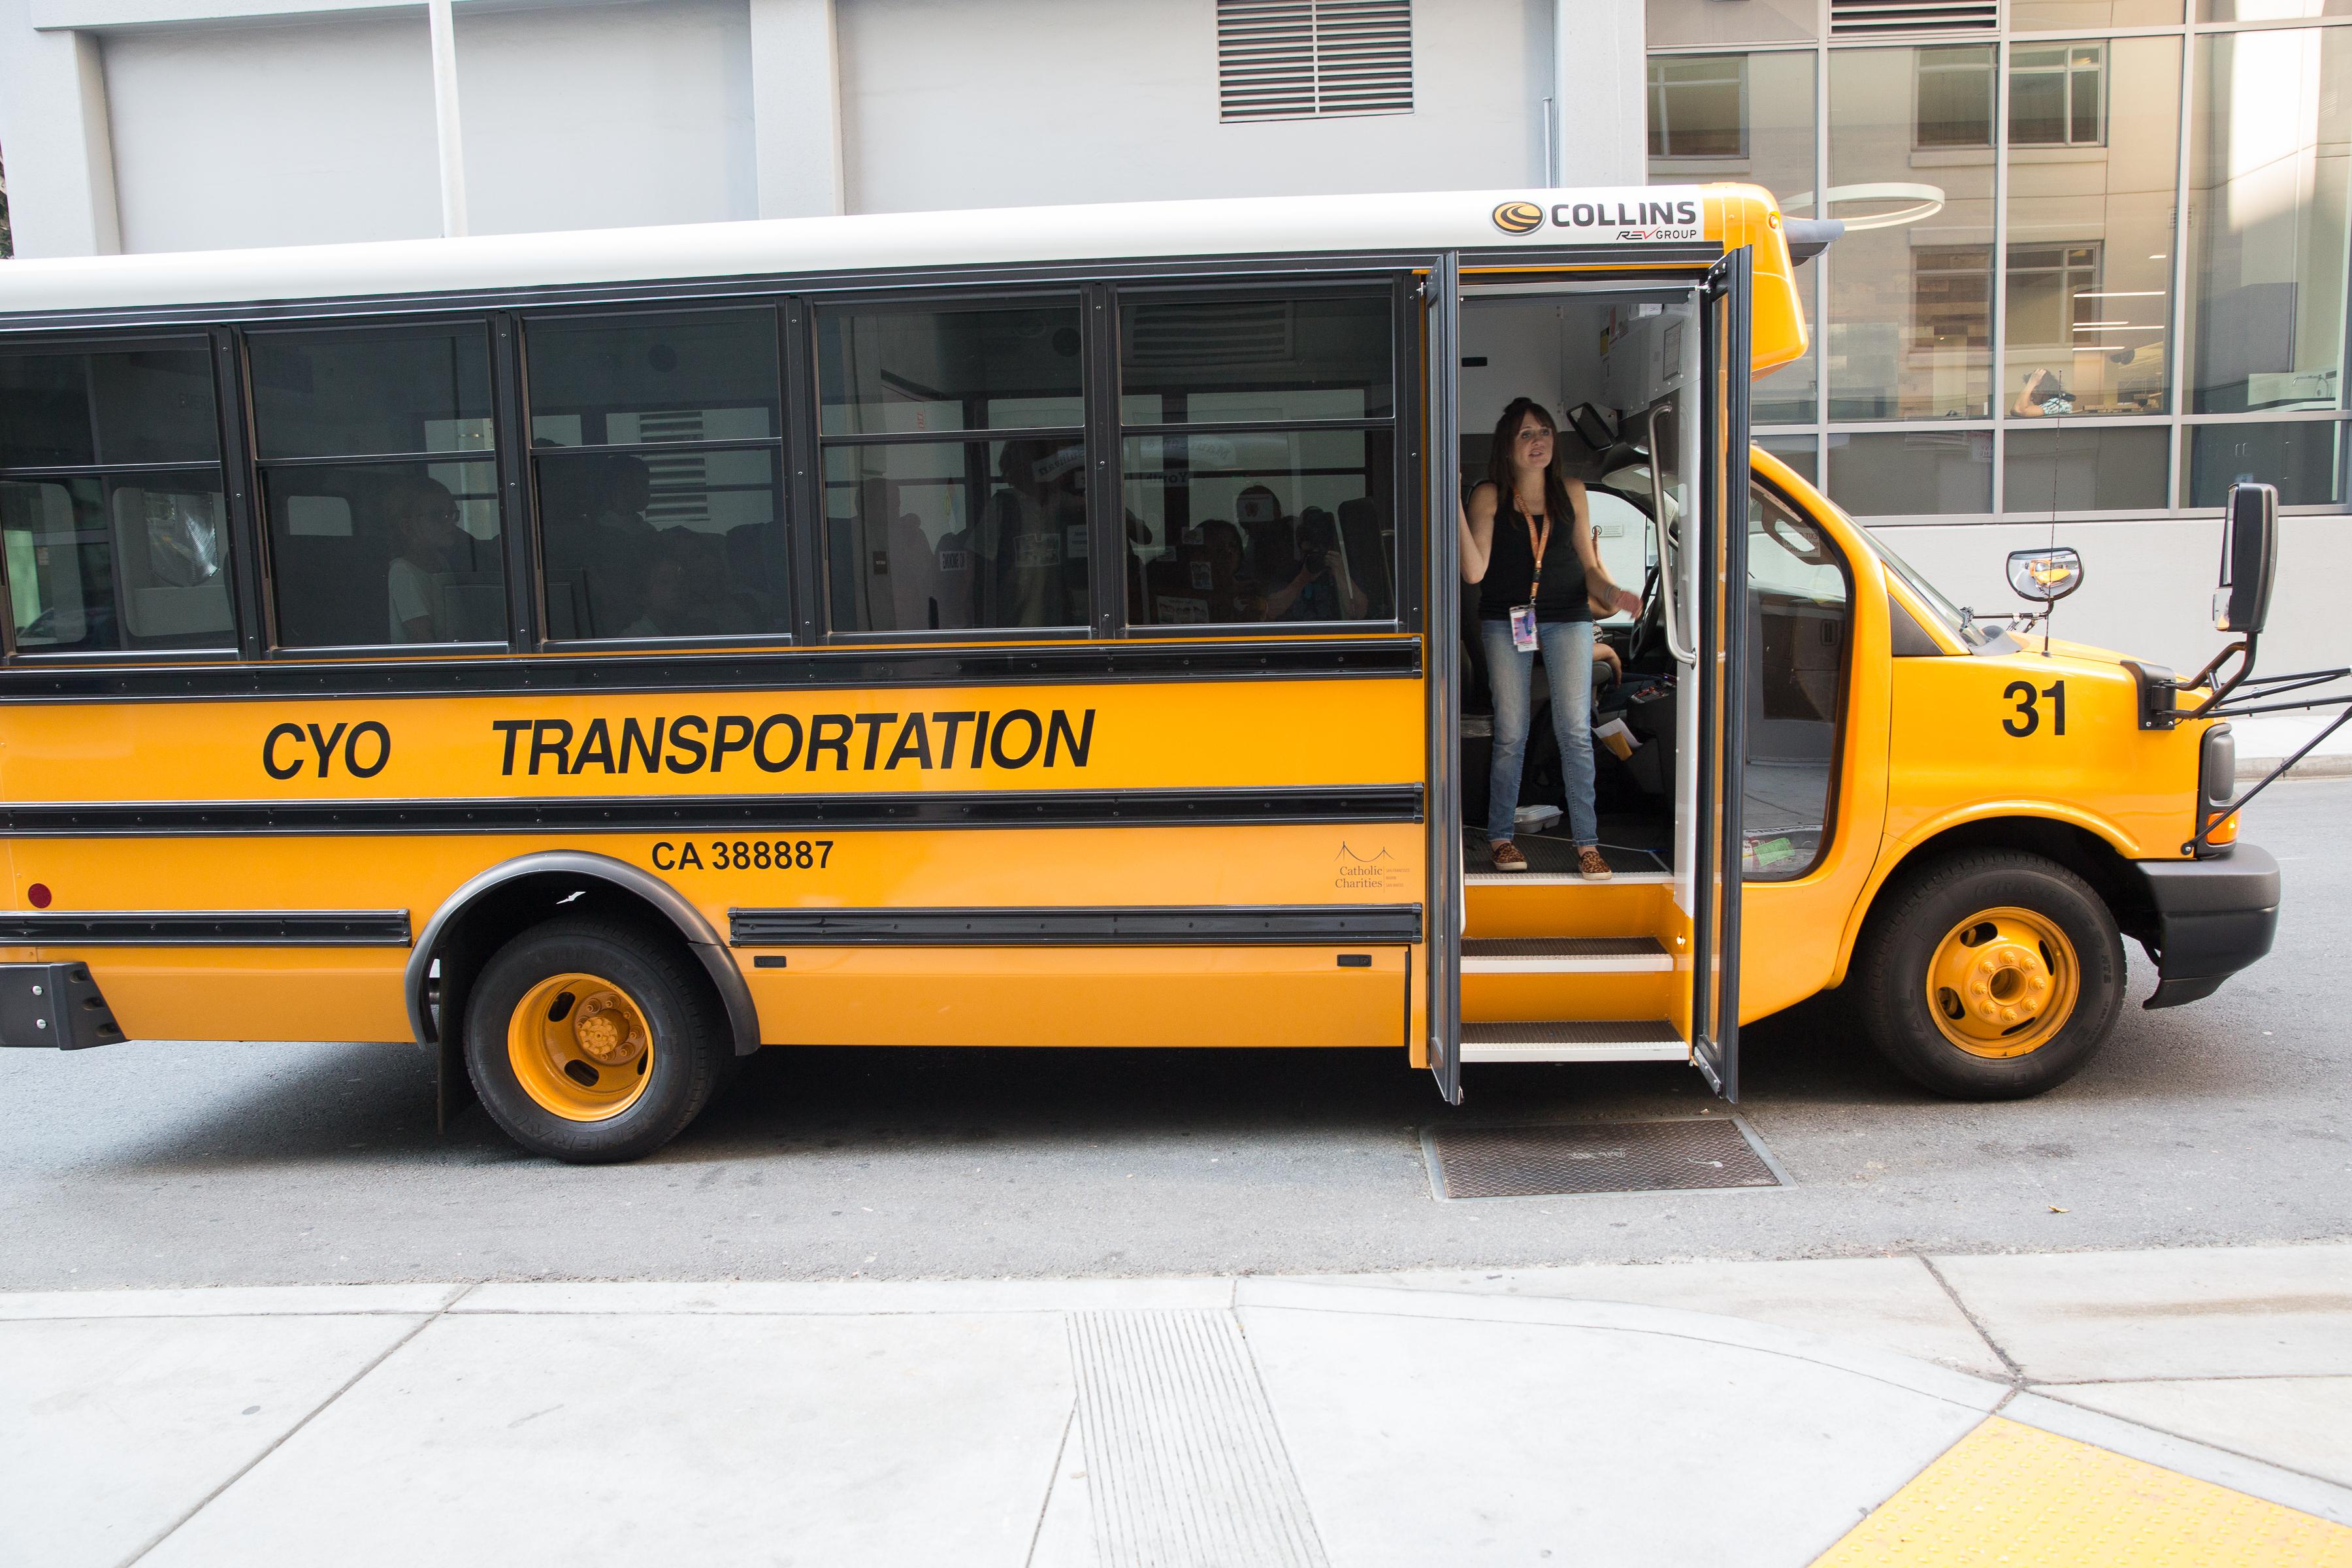 CYO Transportation